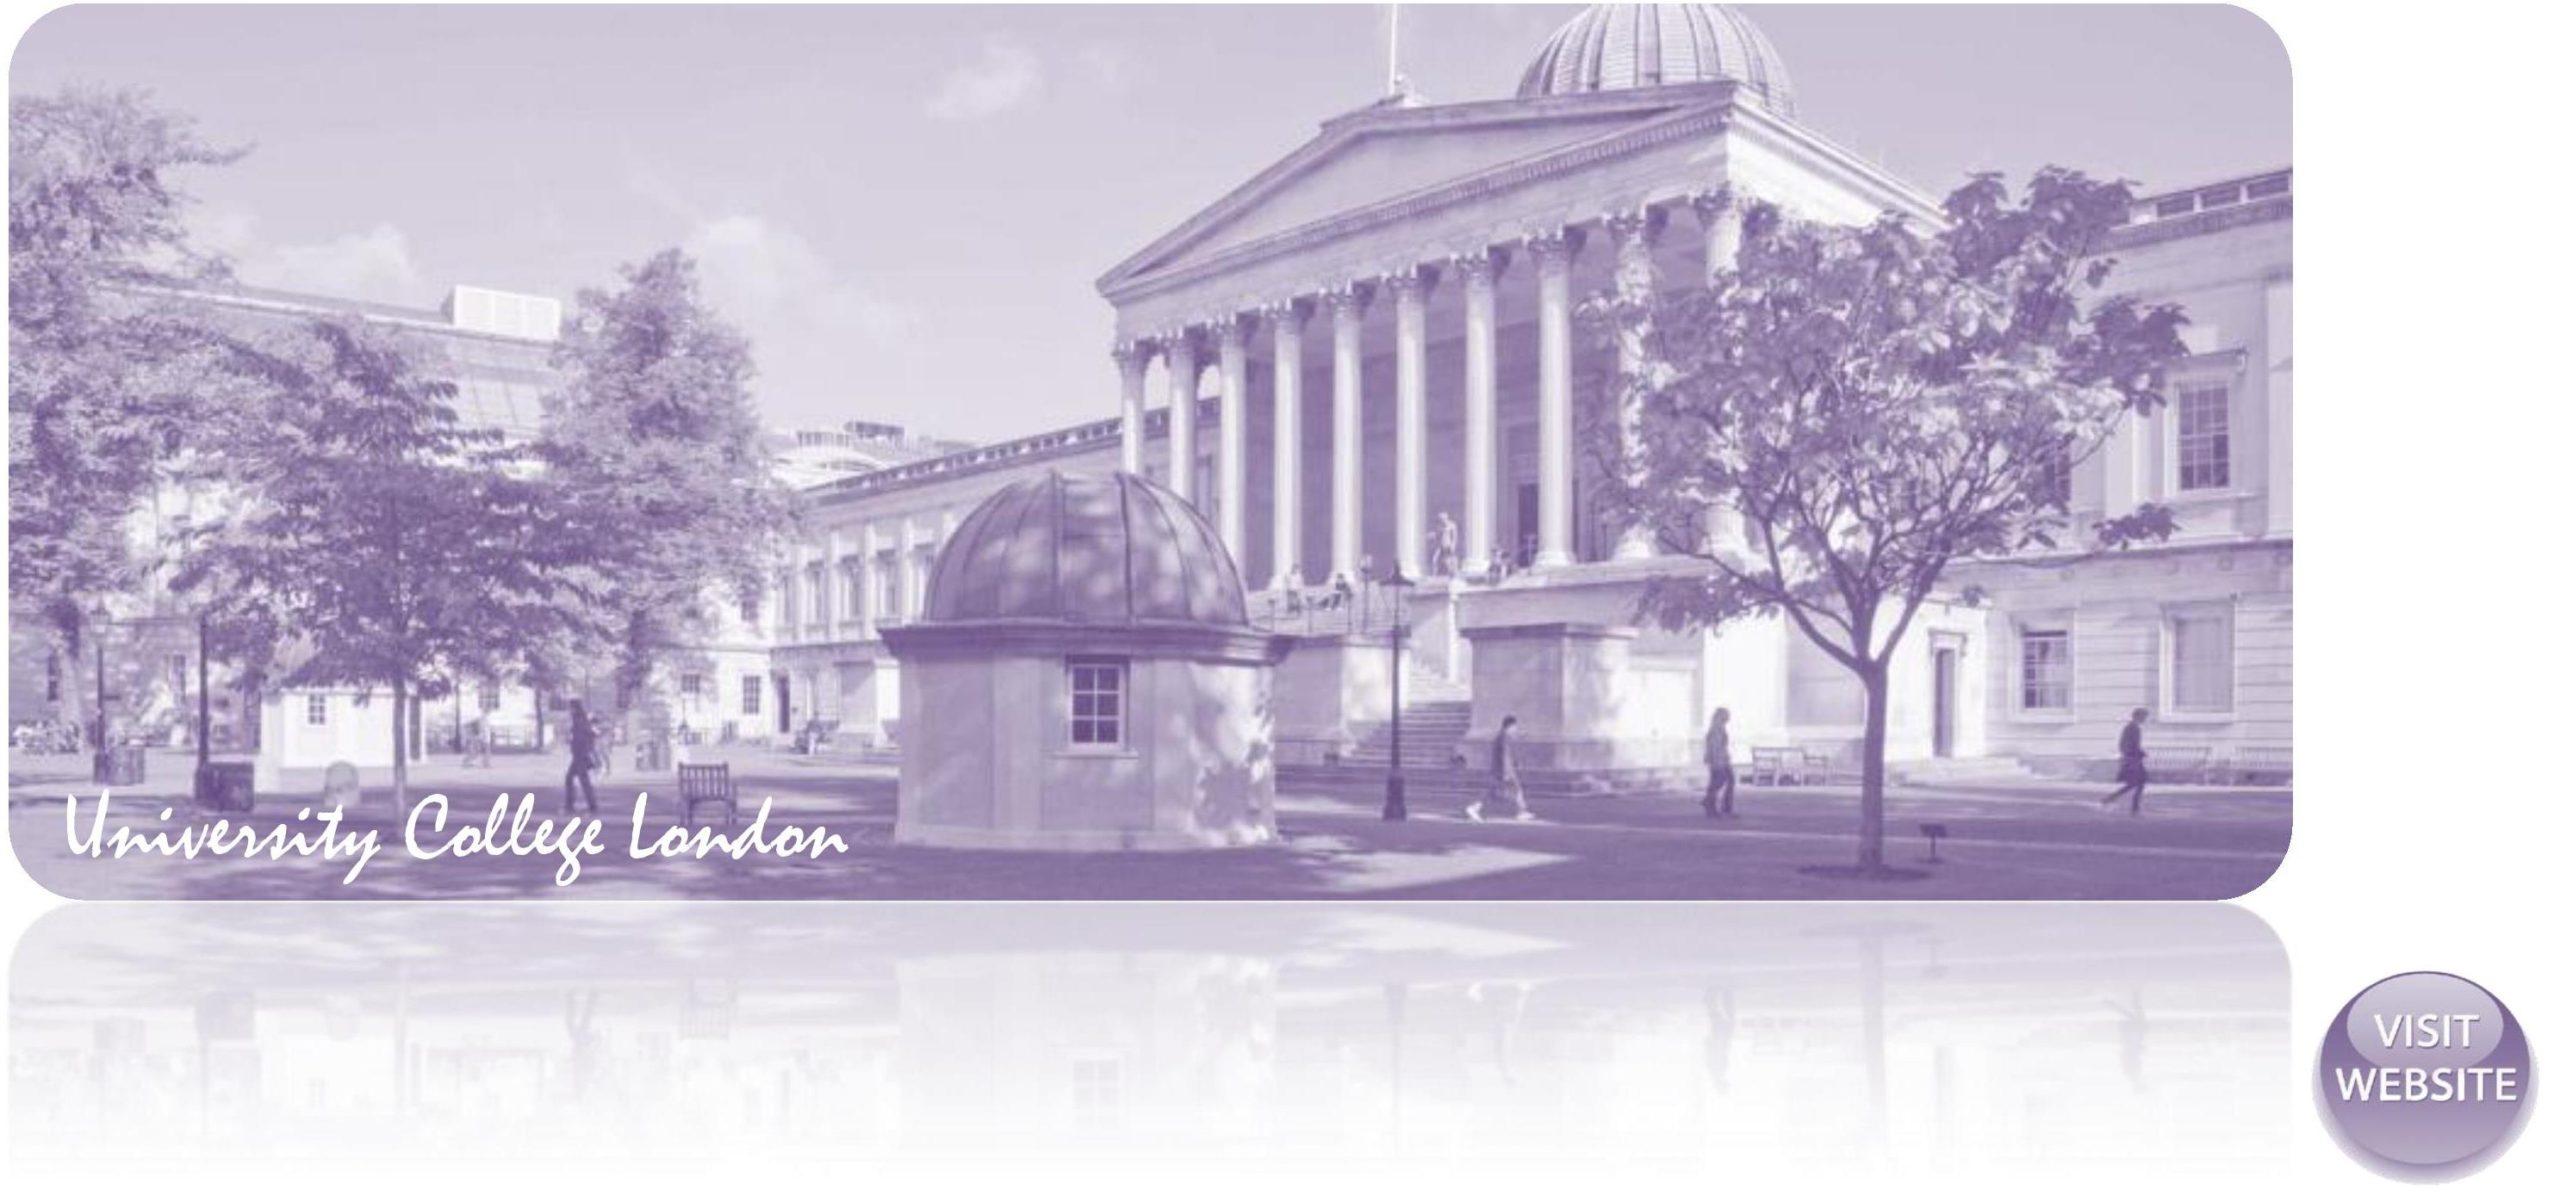 University College London UK